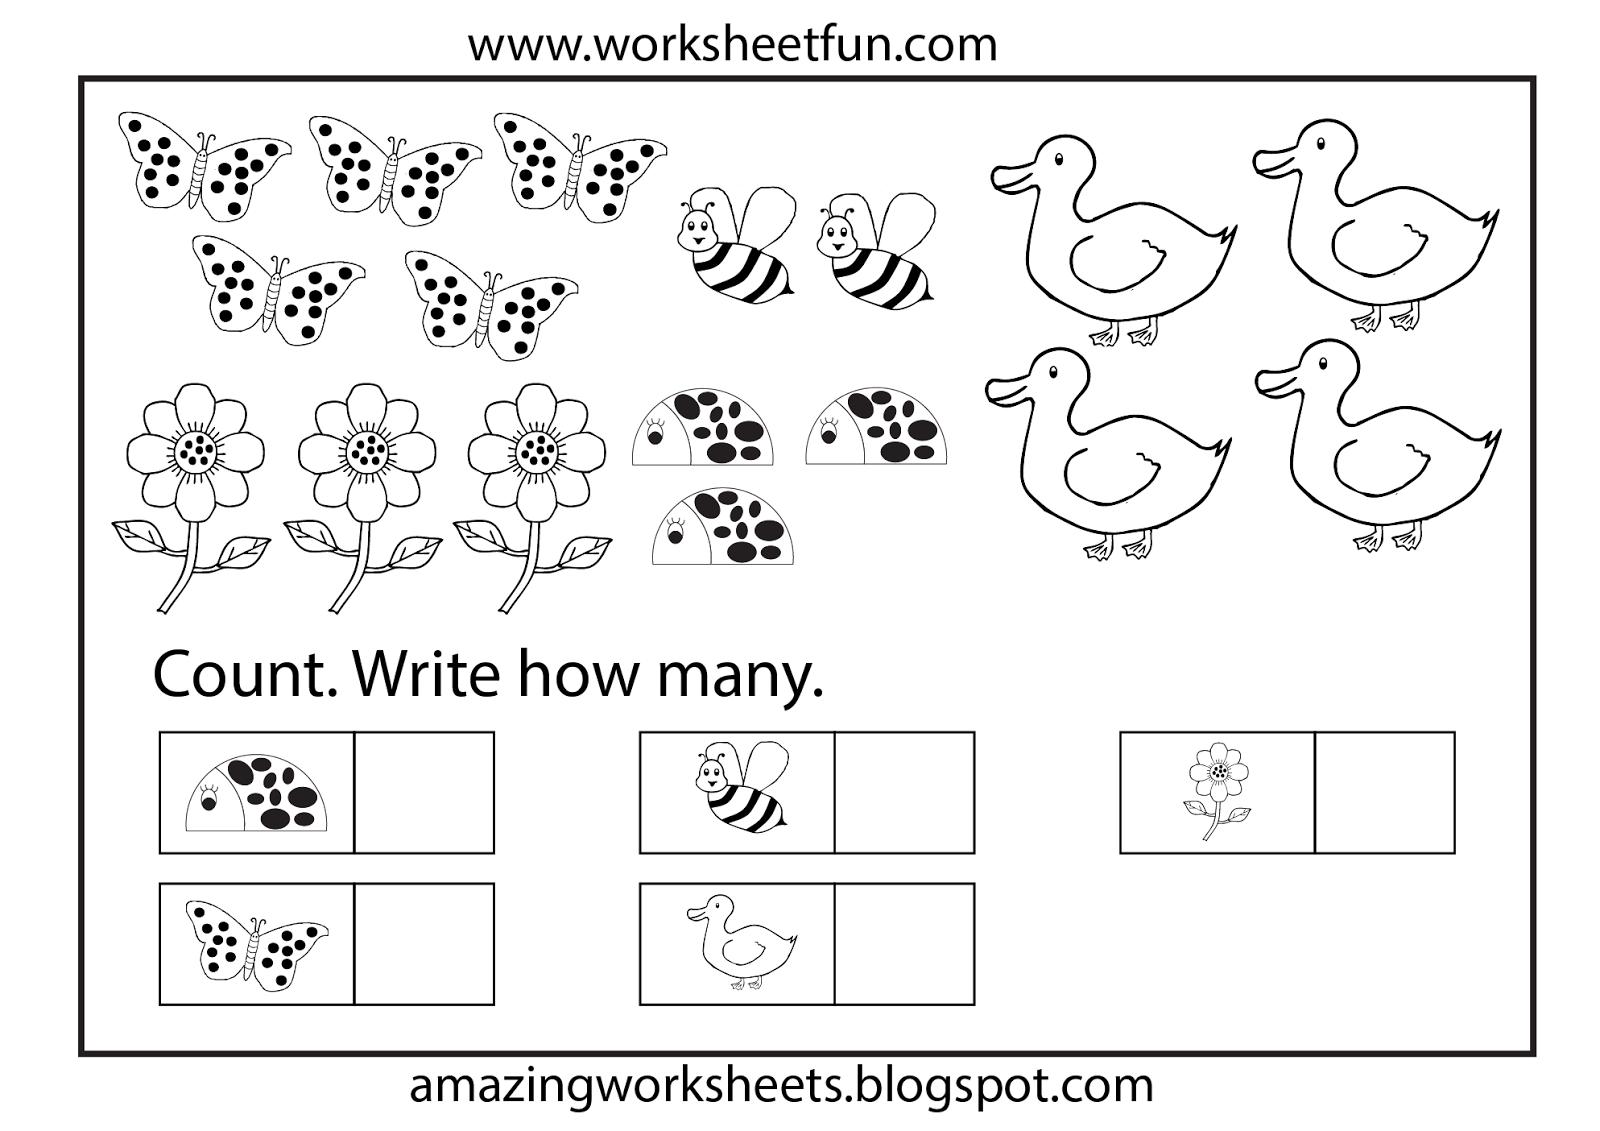 Free Printable Math Worksheet For Kindergarten Worksheets Counting